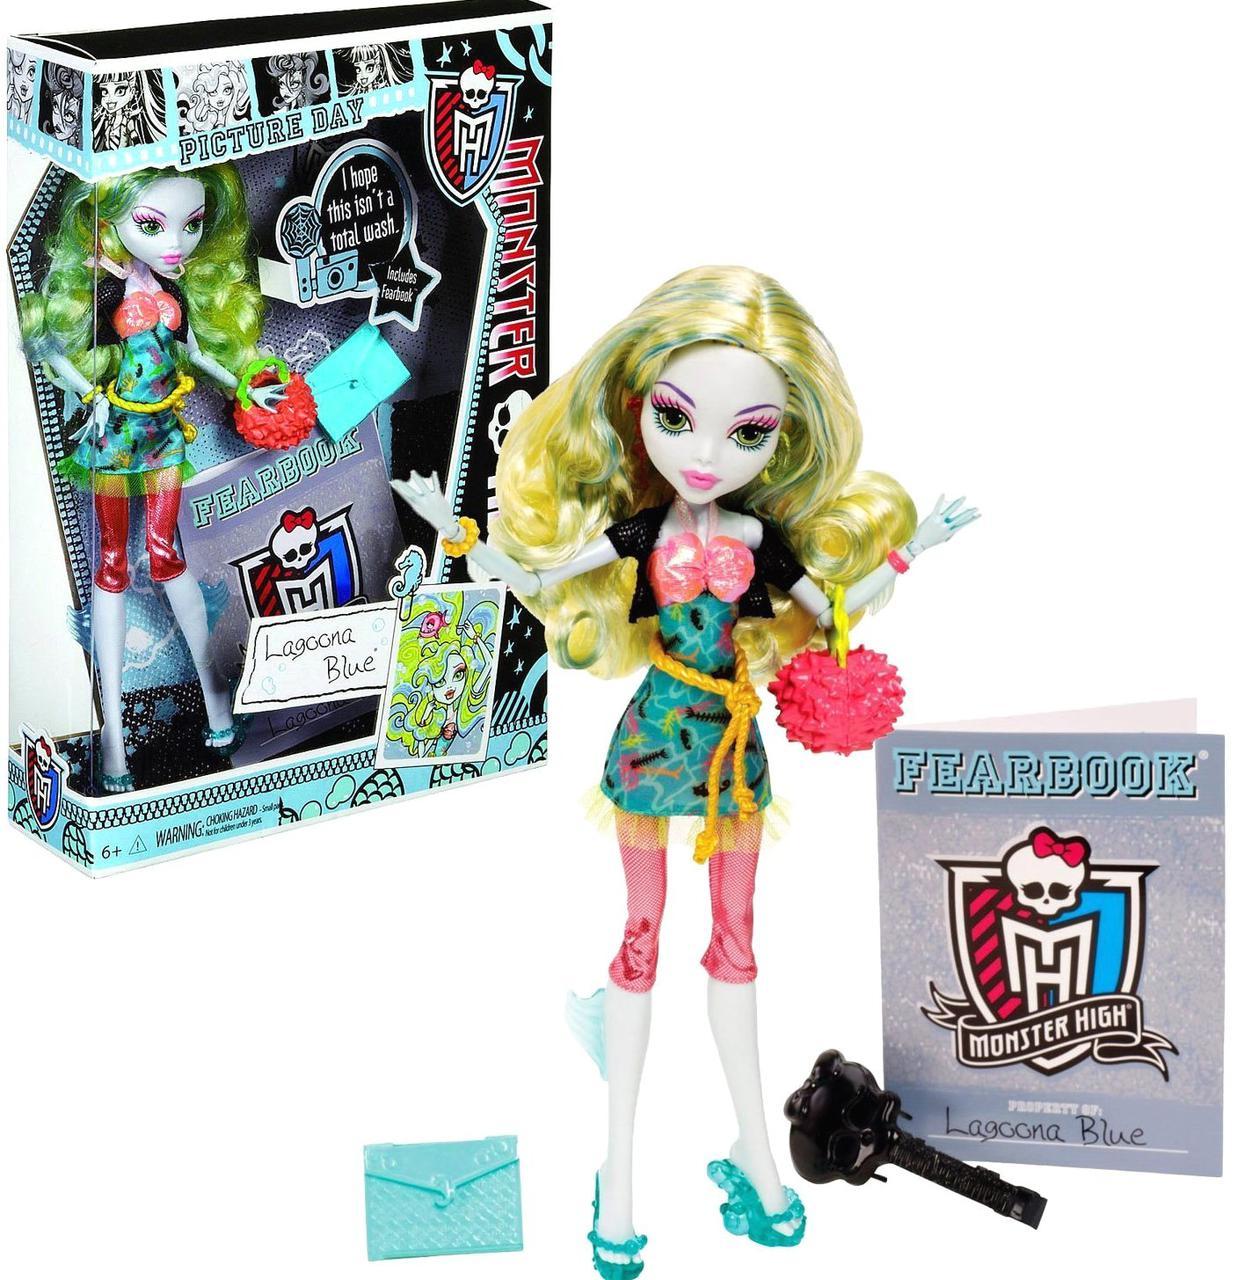 Кукла Monster High Lagoona Blue серия Picture DayЛагуна День фото